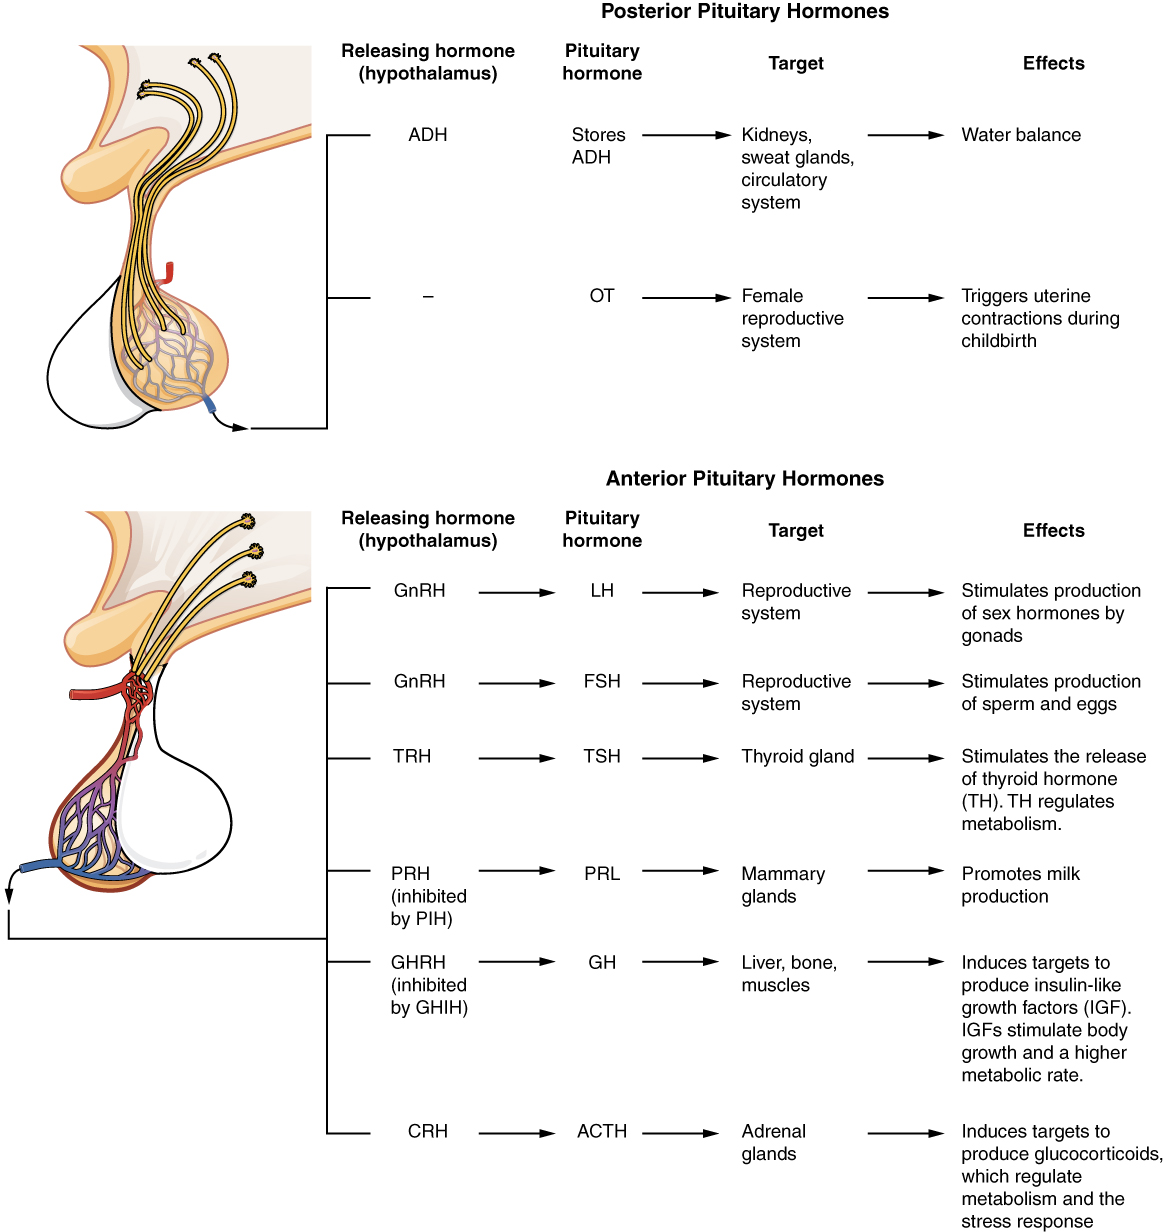 17 3 The Pituitary Gland And Hypothalamus Anatomy And